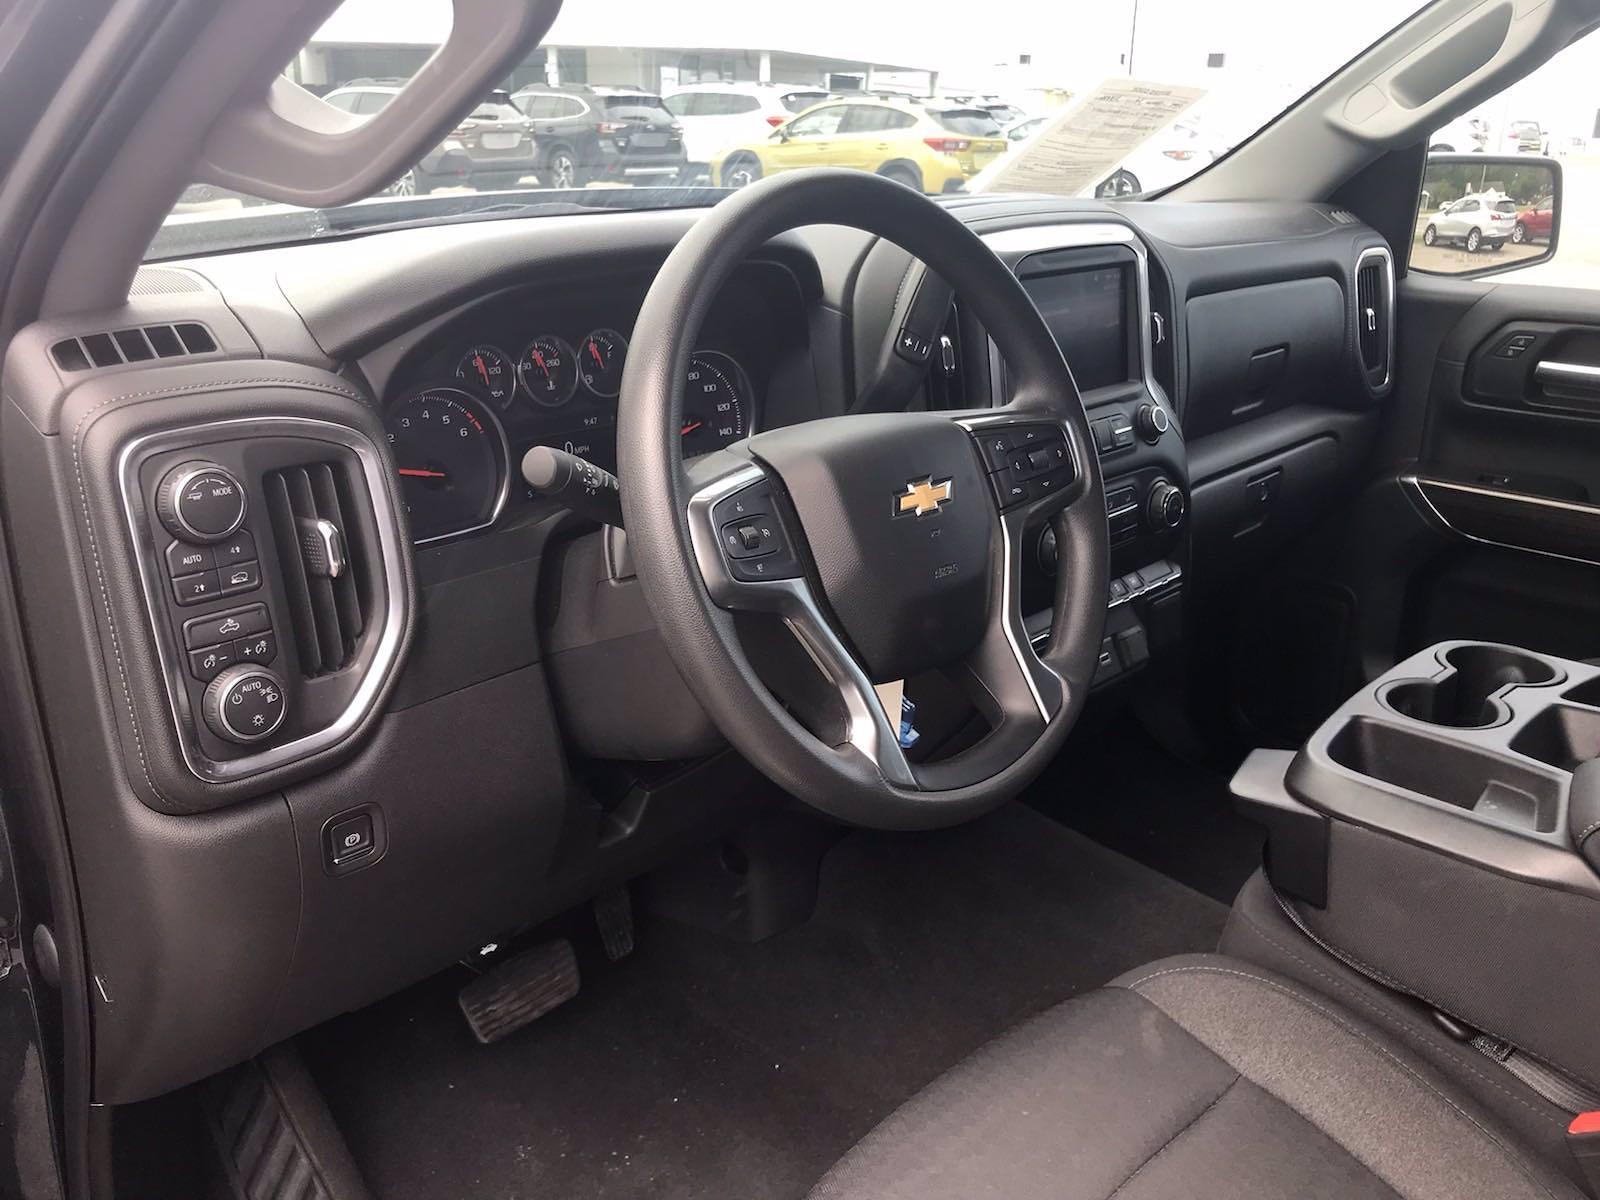 2020 Chevrolet Silverado 1500 Crew Cab 4x4, Pickup #16476PN - photo 24